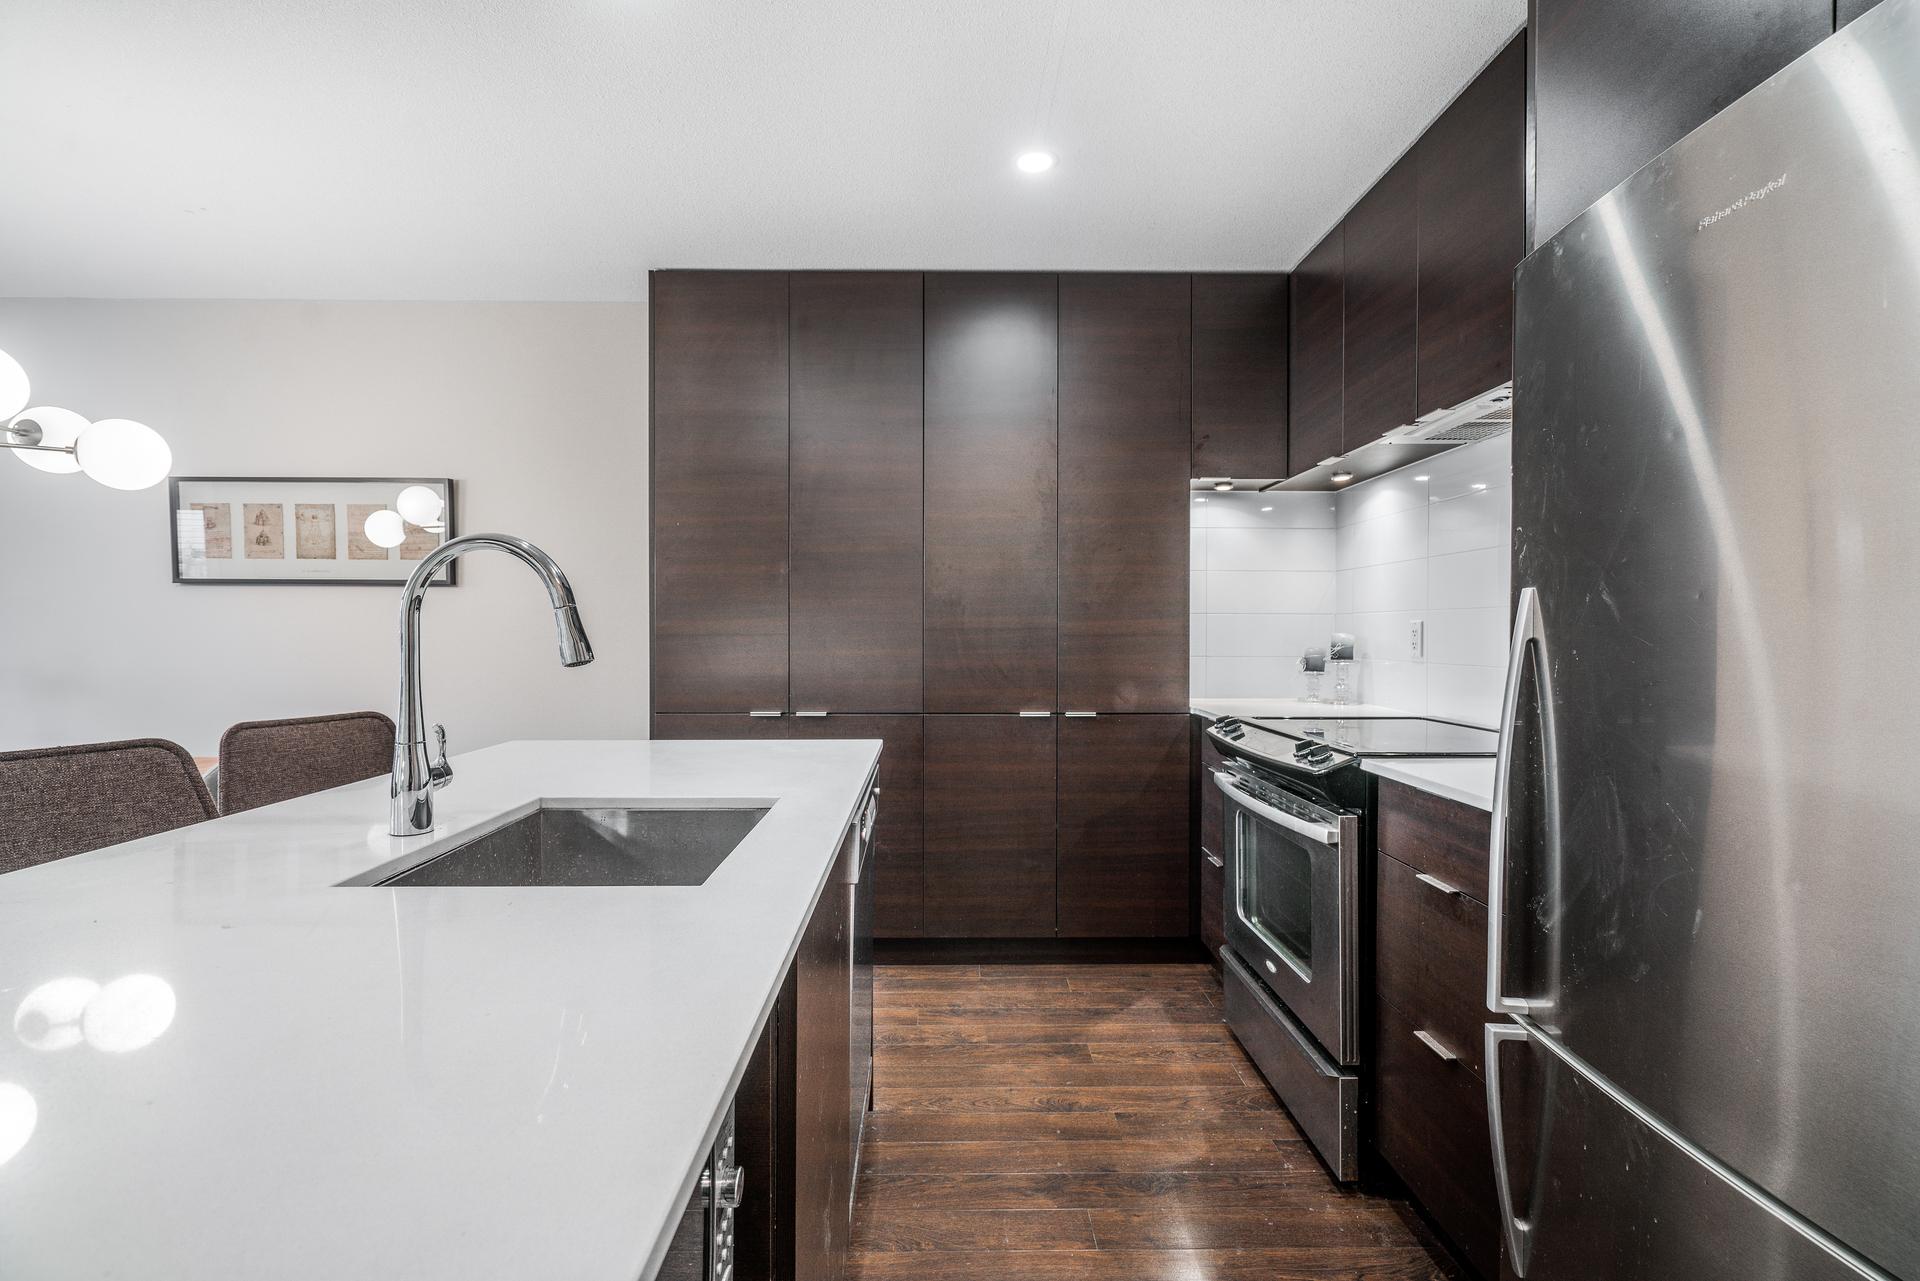 unit-410-1677-lloyd-avenue-north-vancouver-5 at 410 - 1677 Lloyd Avenue, Pemberton NV, North Vancouver